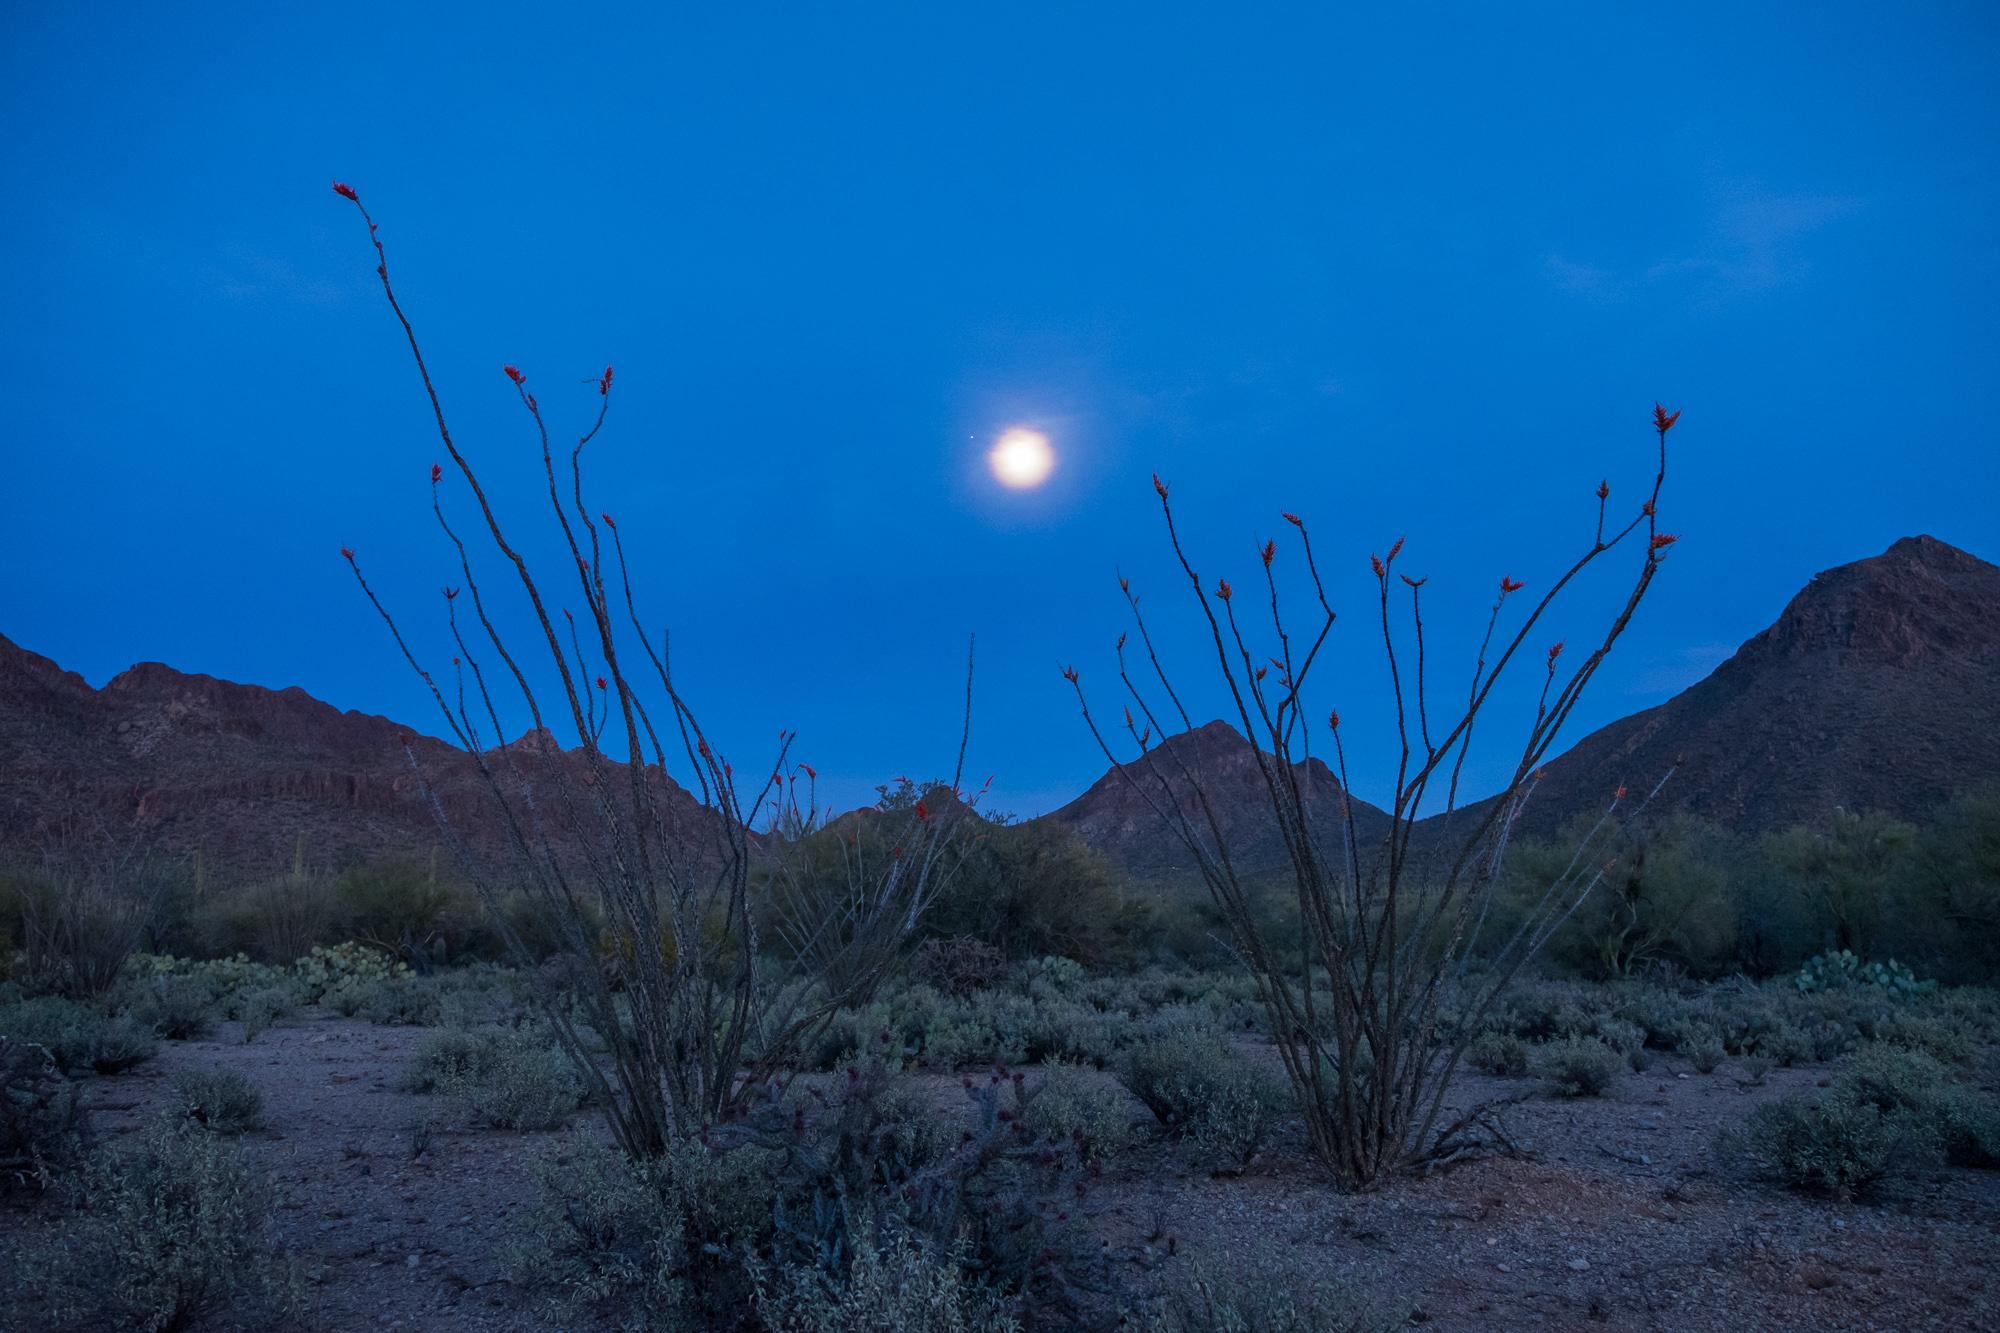 Moon glow at Saguaro National Park in Arizona.